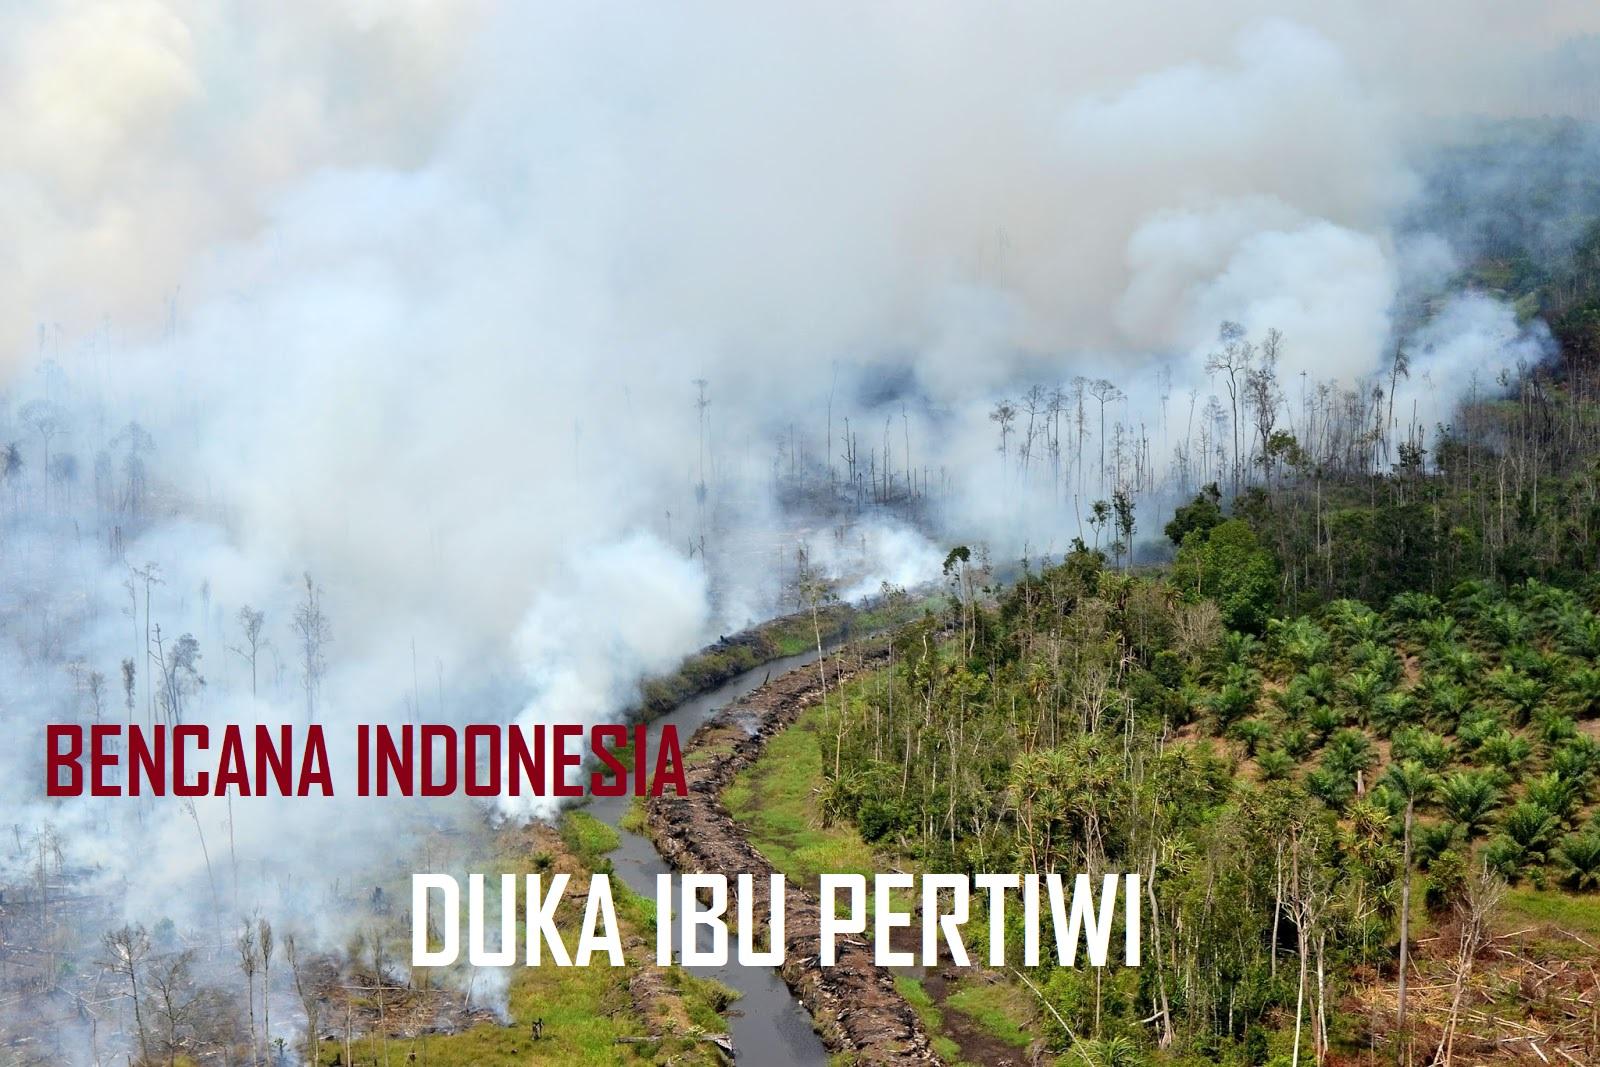 BENCANA INDONESIA DUKA IBU PERTIWI